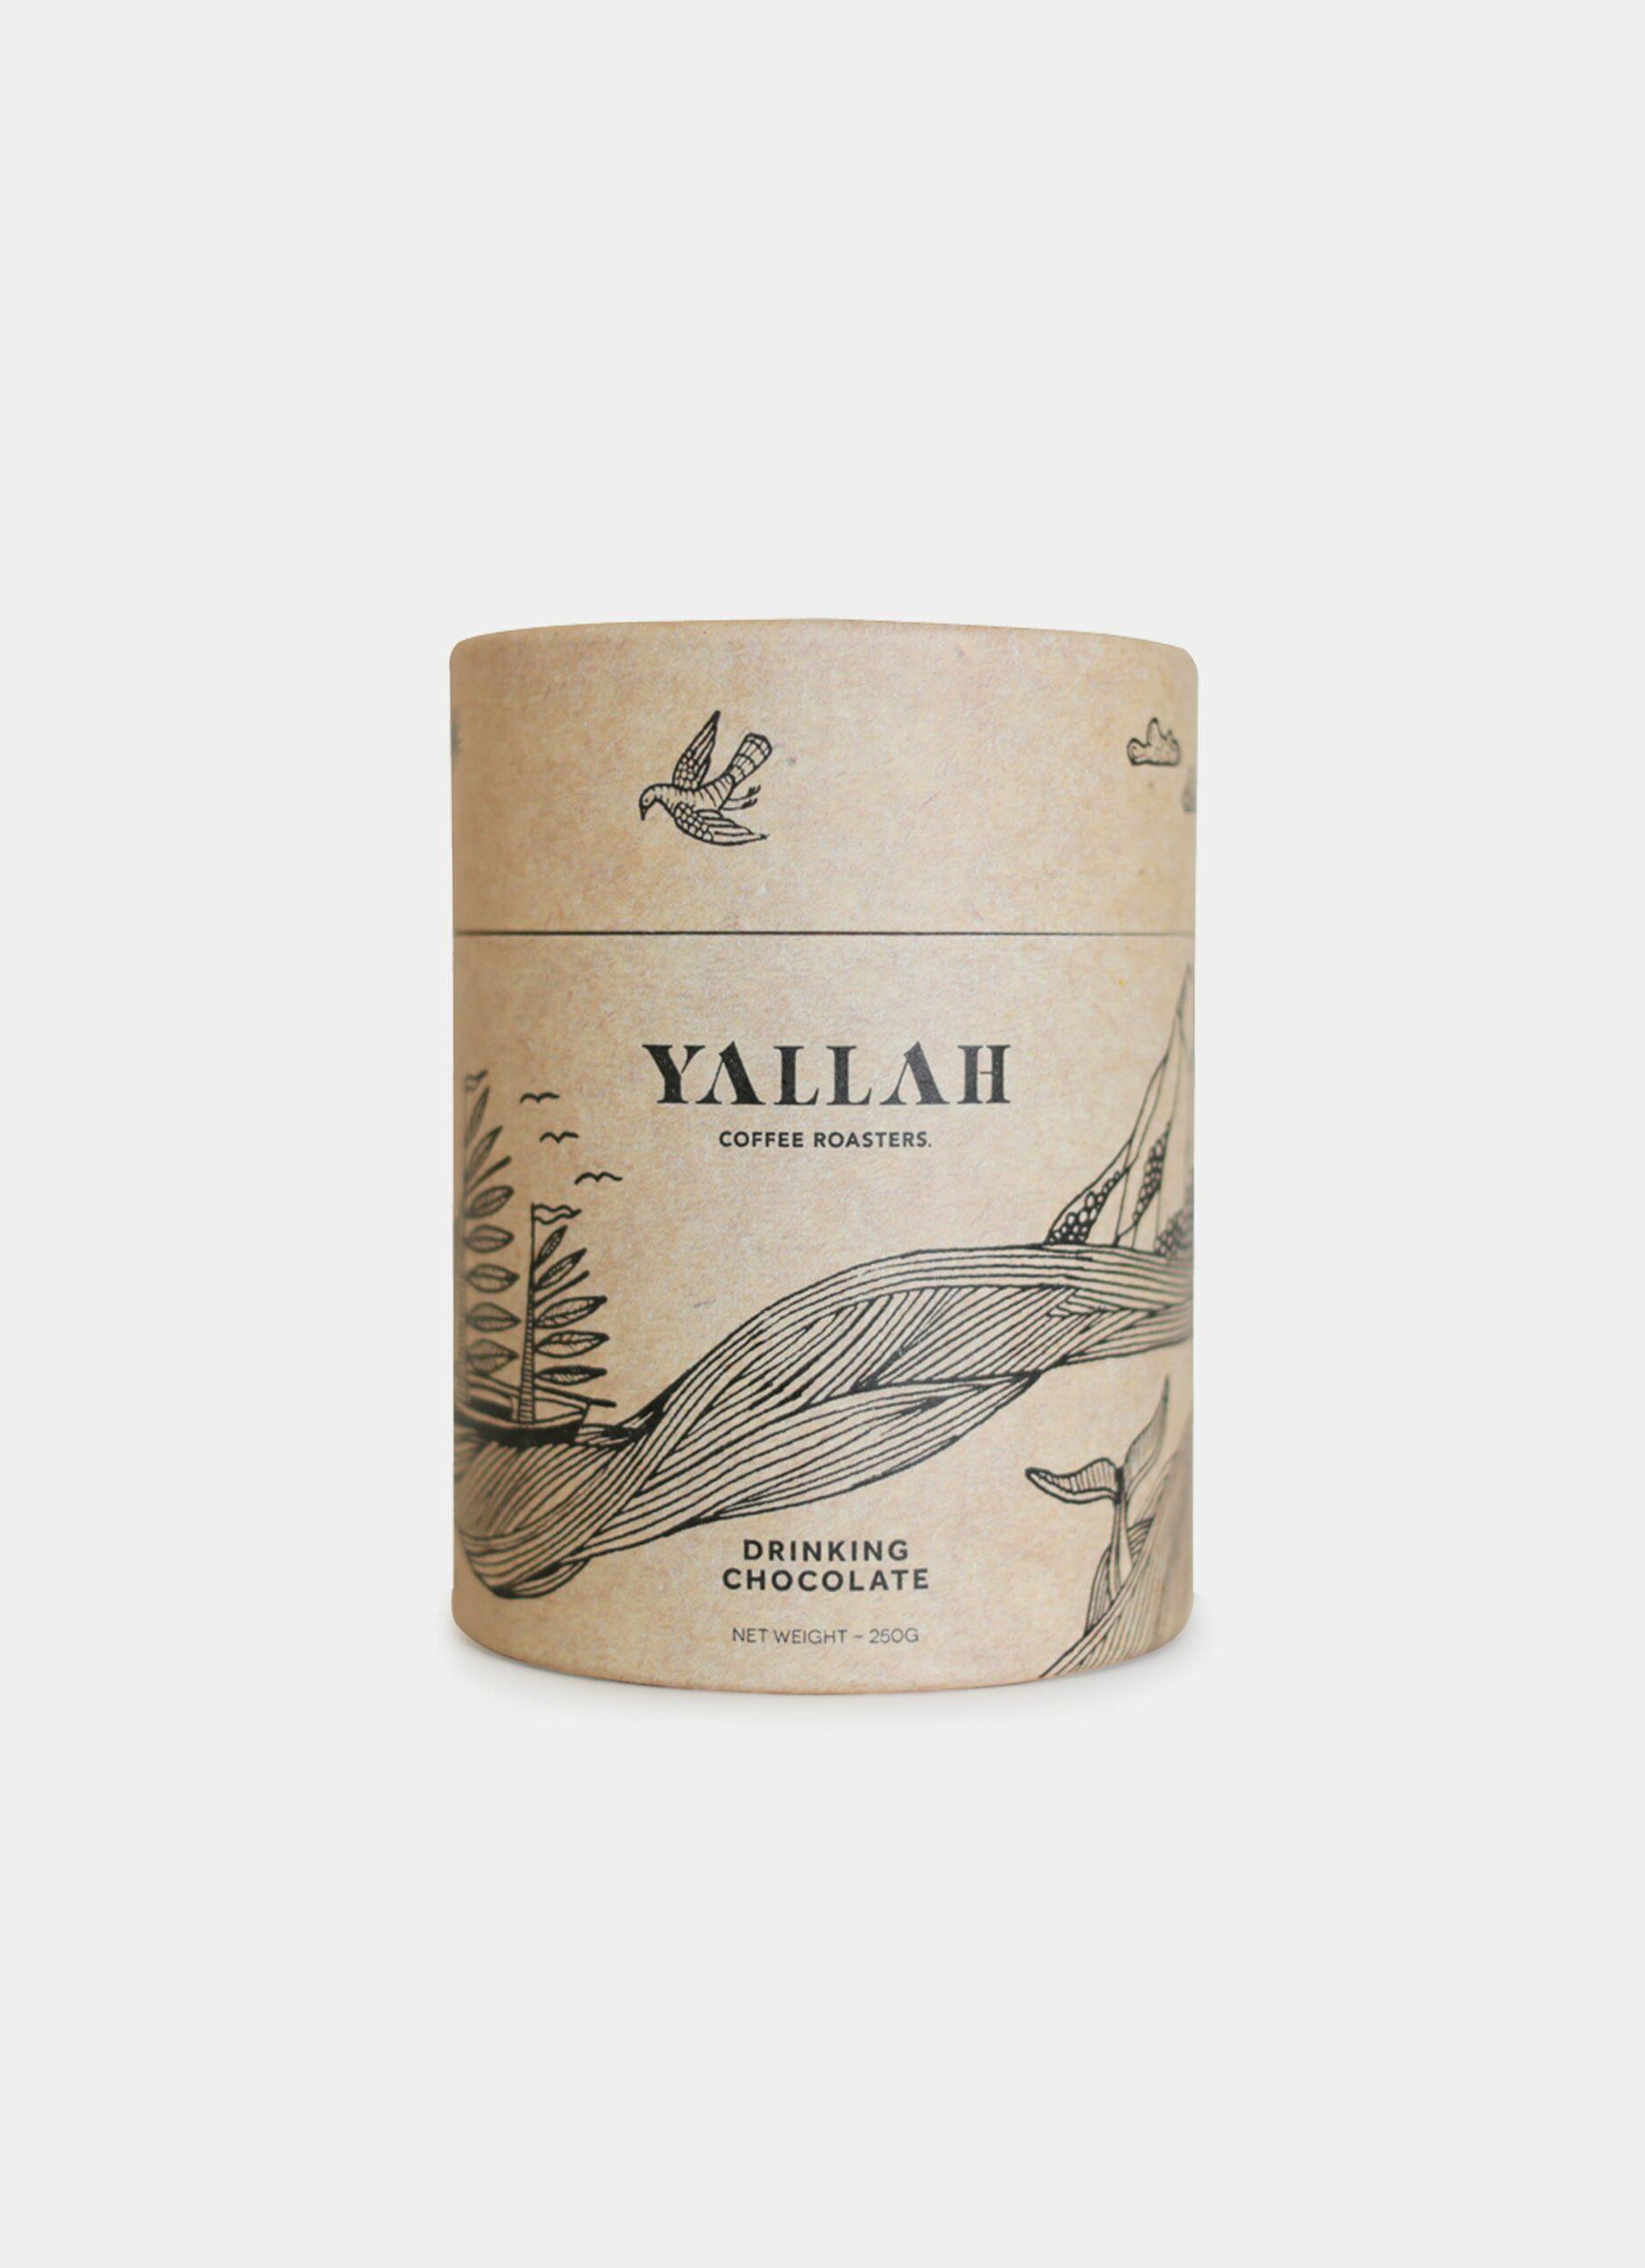 Yallah Coffee Roasters - Chocolarder - Drinking chocolate